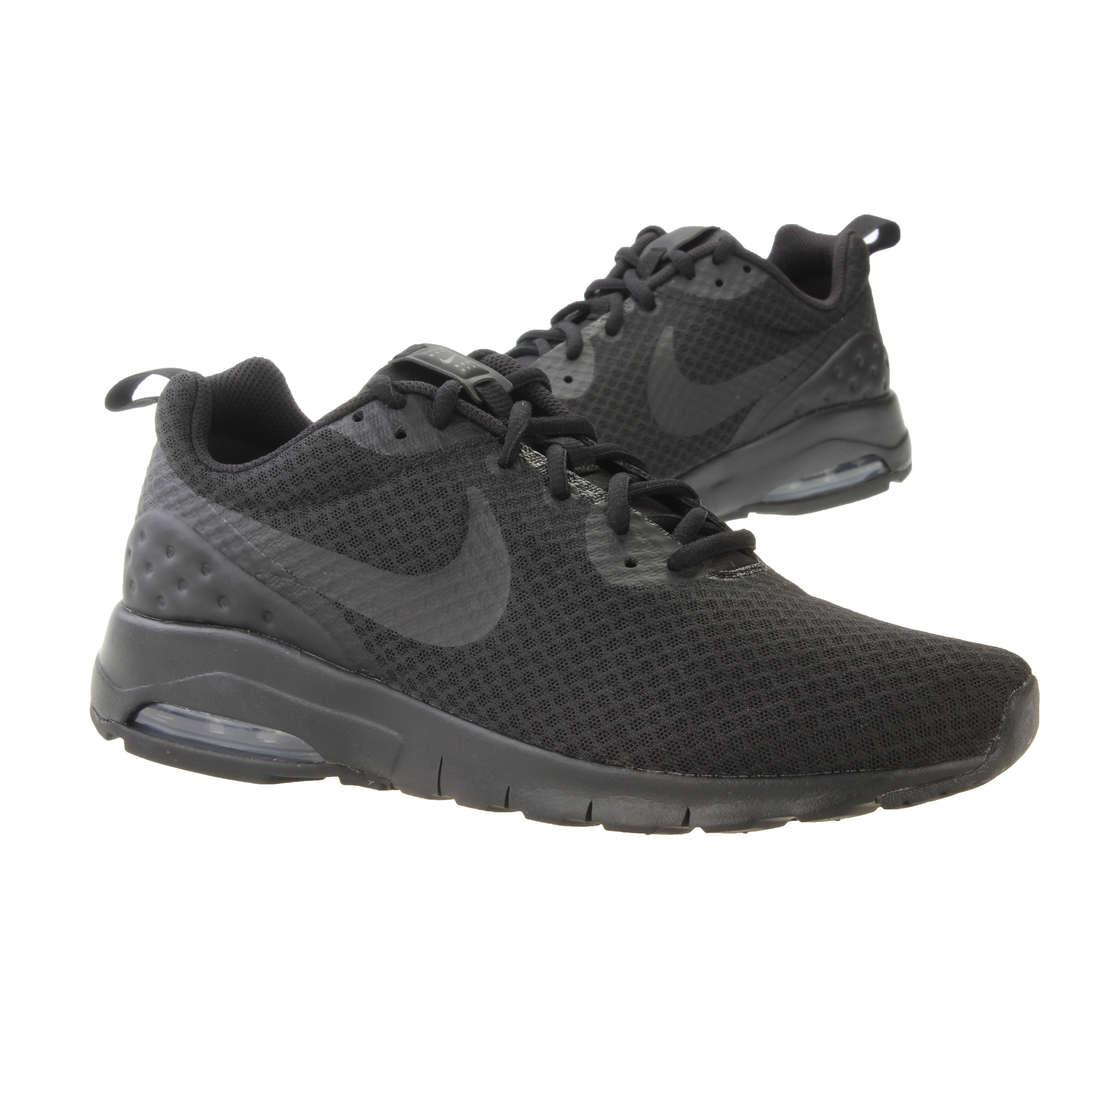 huge selection of d9839 47869 Buty Męskie Nike Air Max Motion 833260-002 r.44